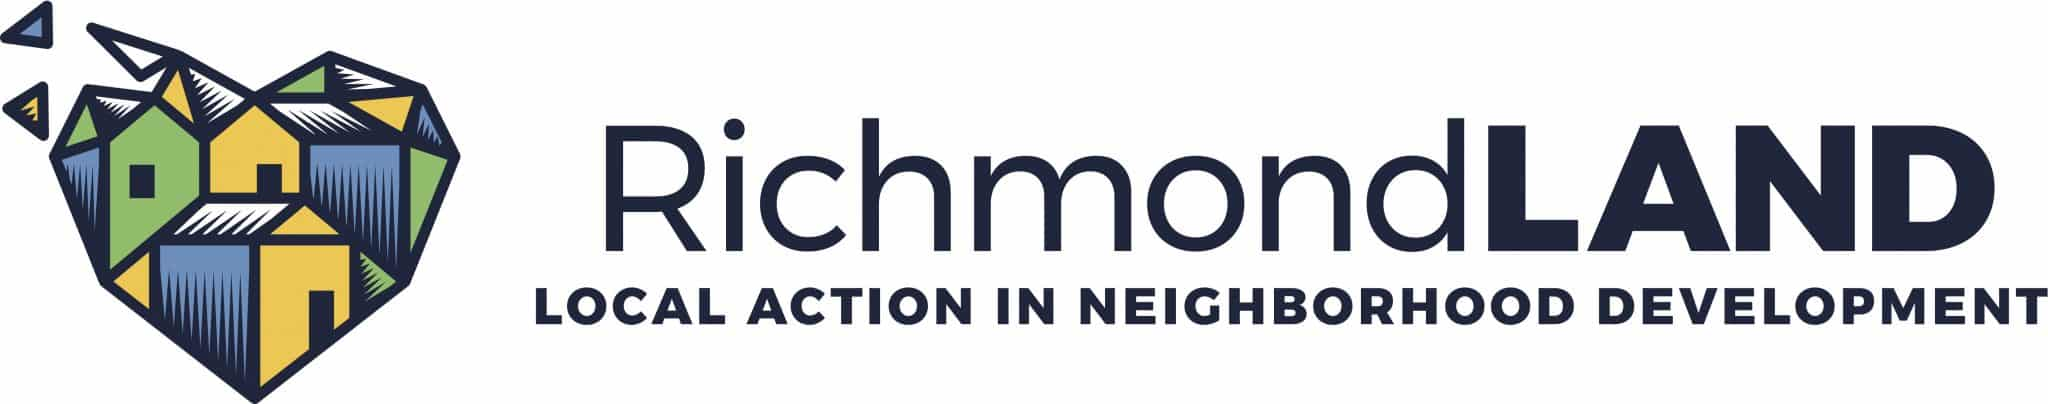 Richmond LAND